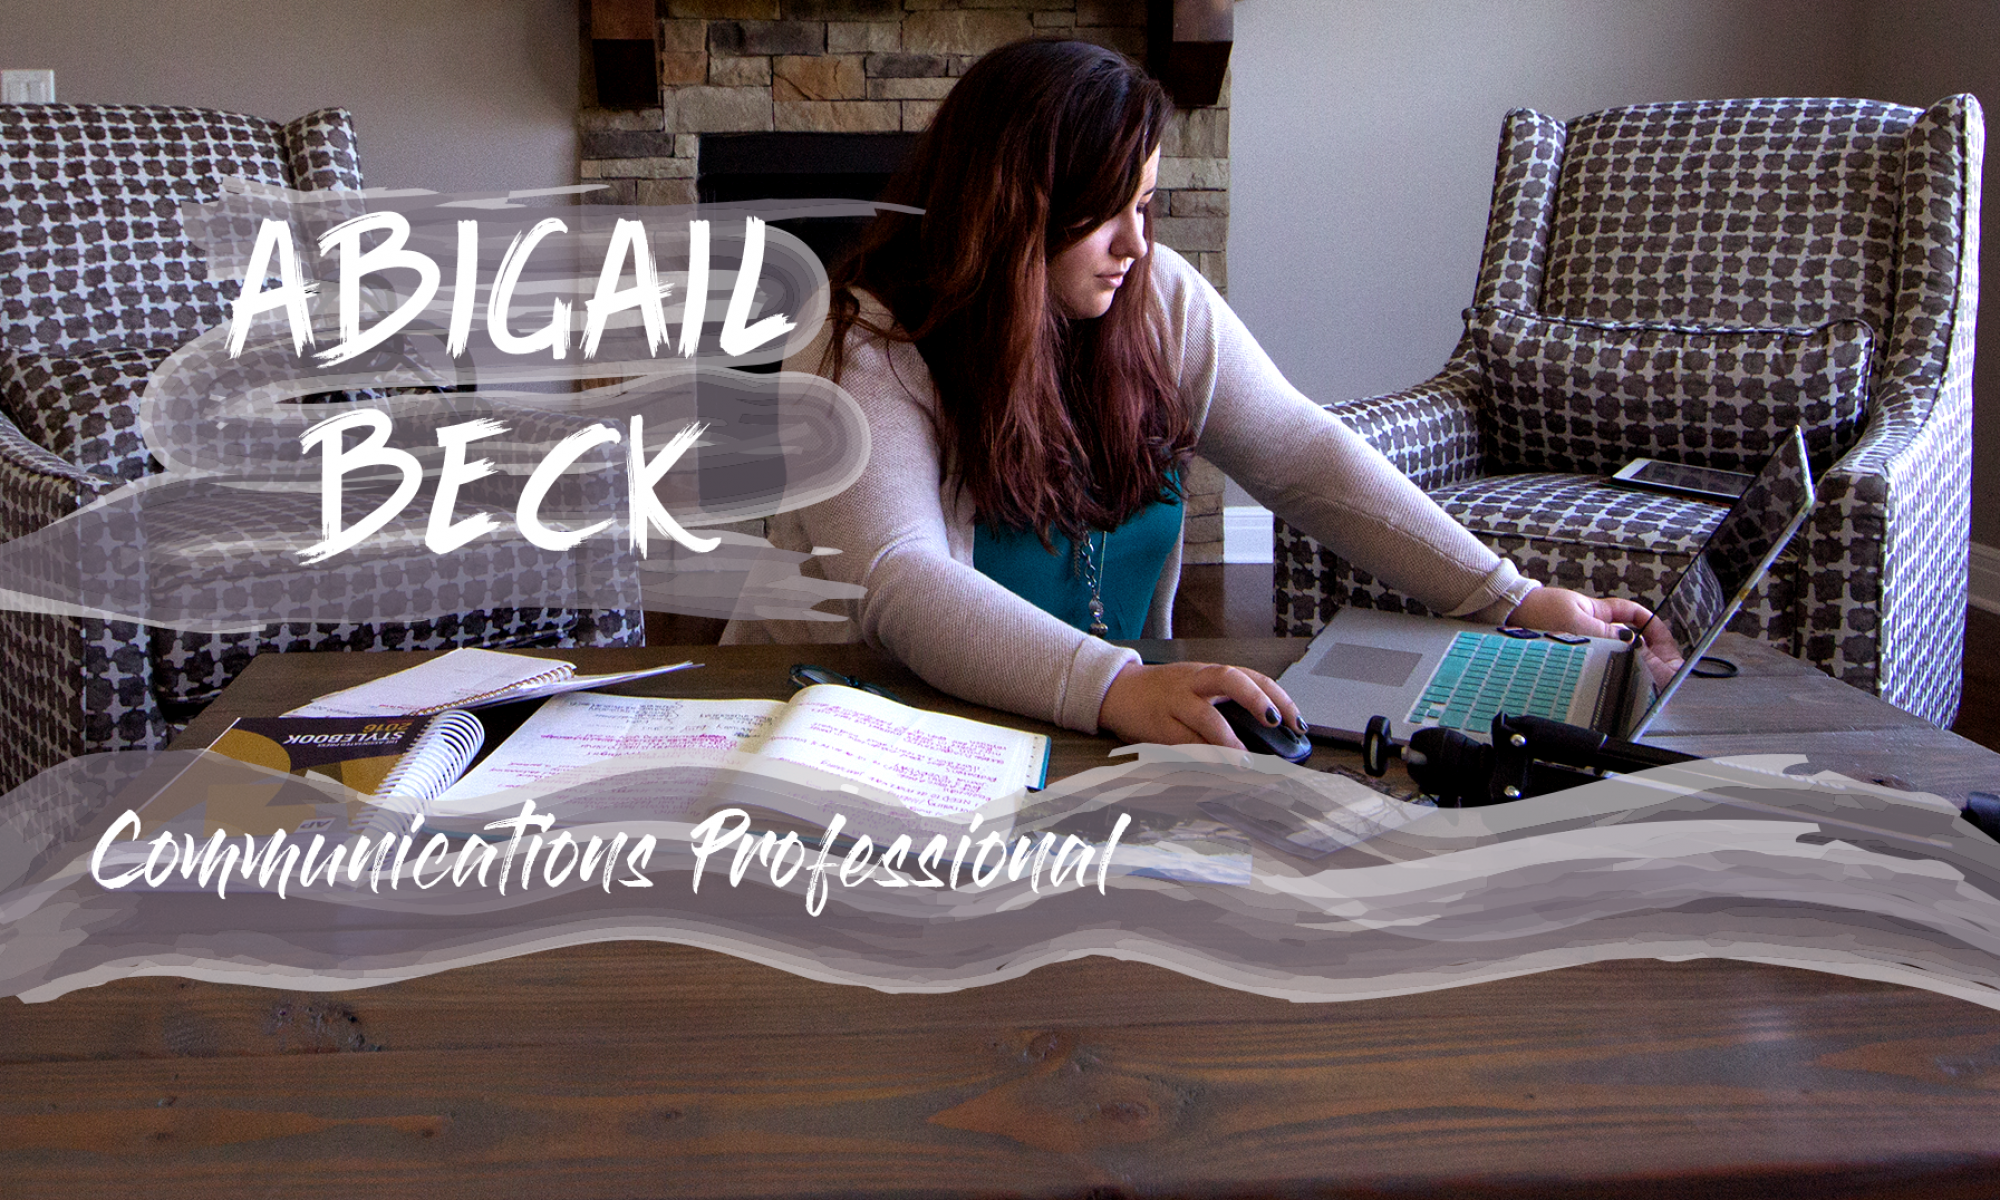 Abigail Beck's portfolio